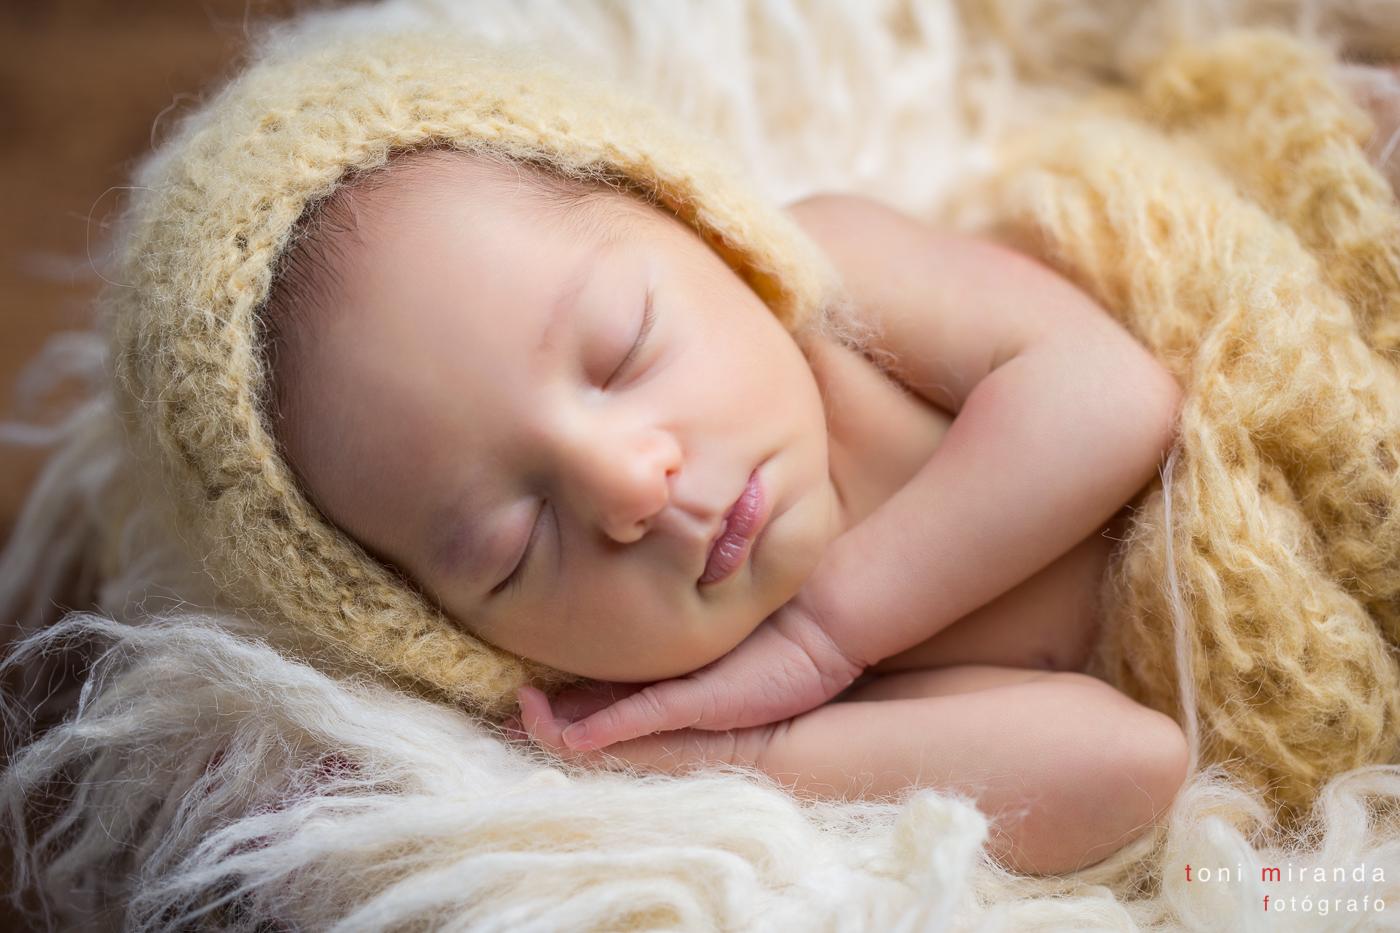 niña recien nacida arropada